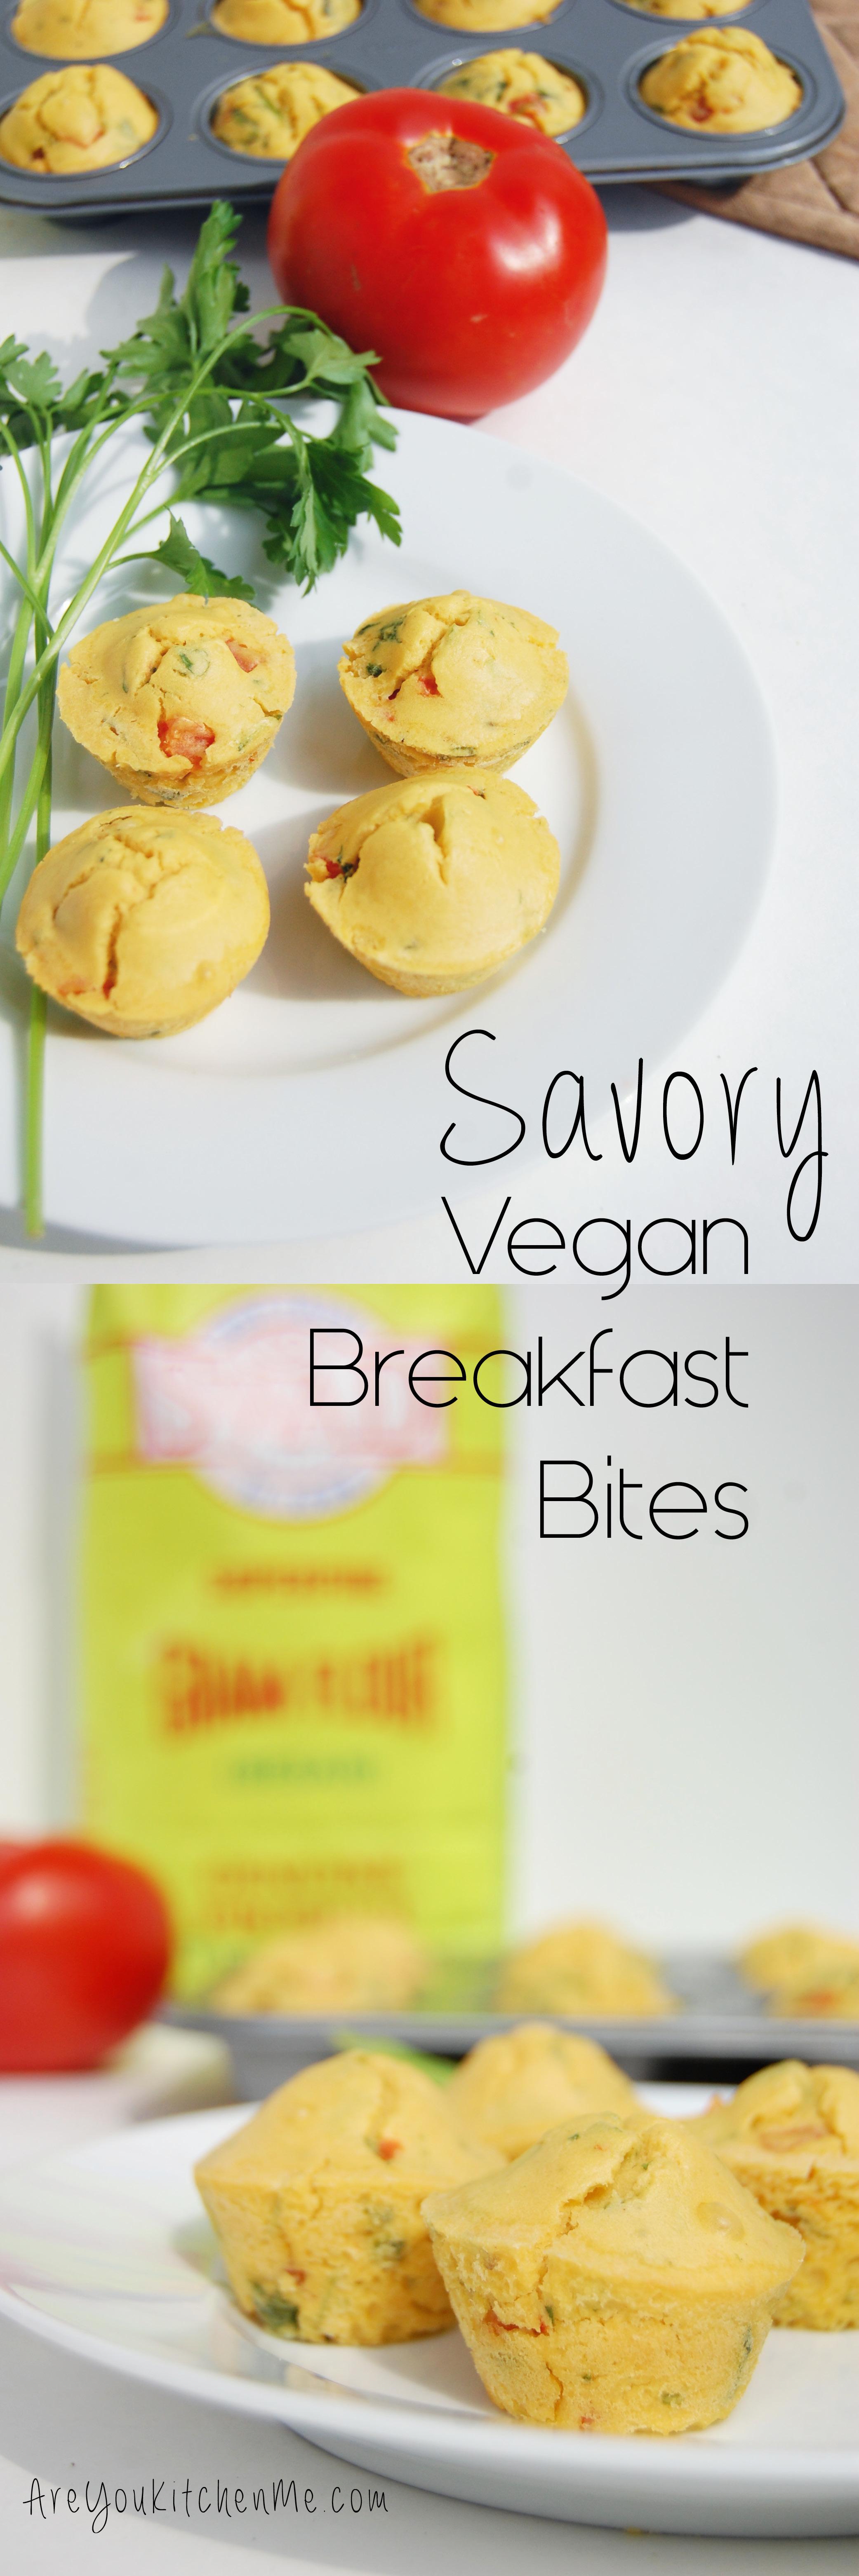 Savory Vegan Breakfast Bites